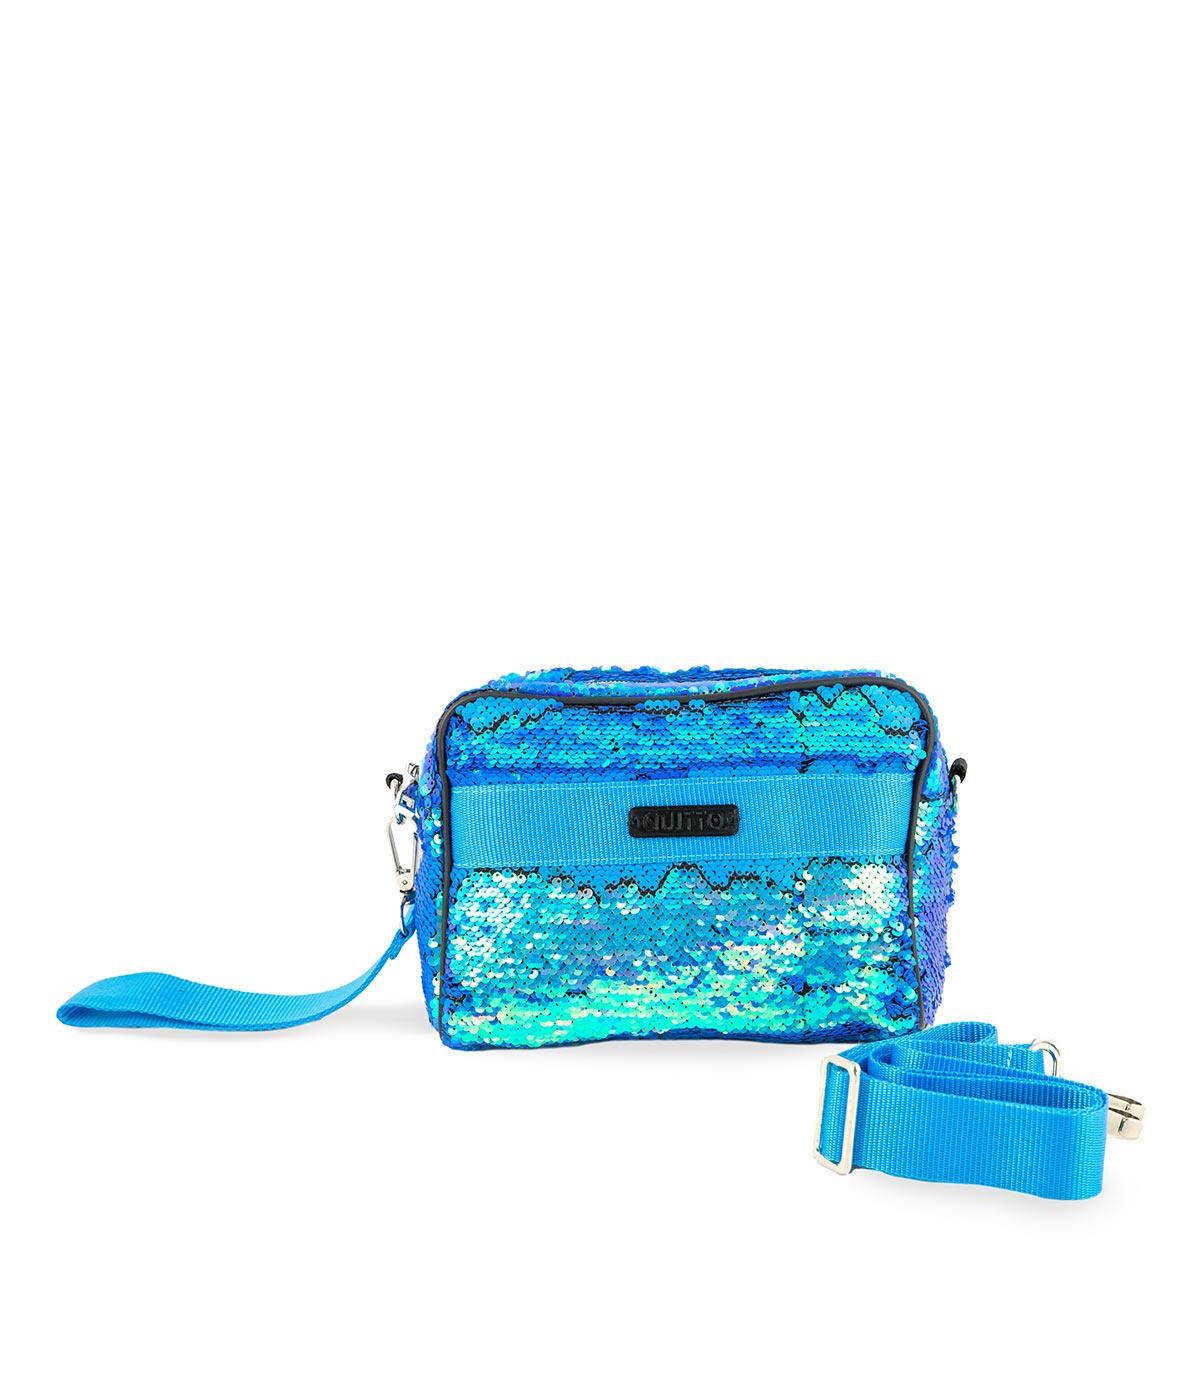 beauty-bag-paillettes-riga-azzurra-fronte